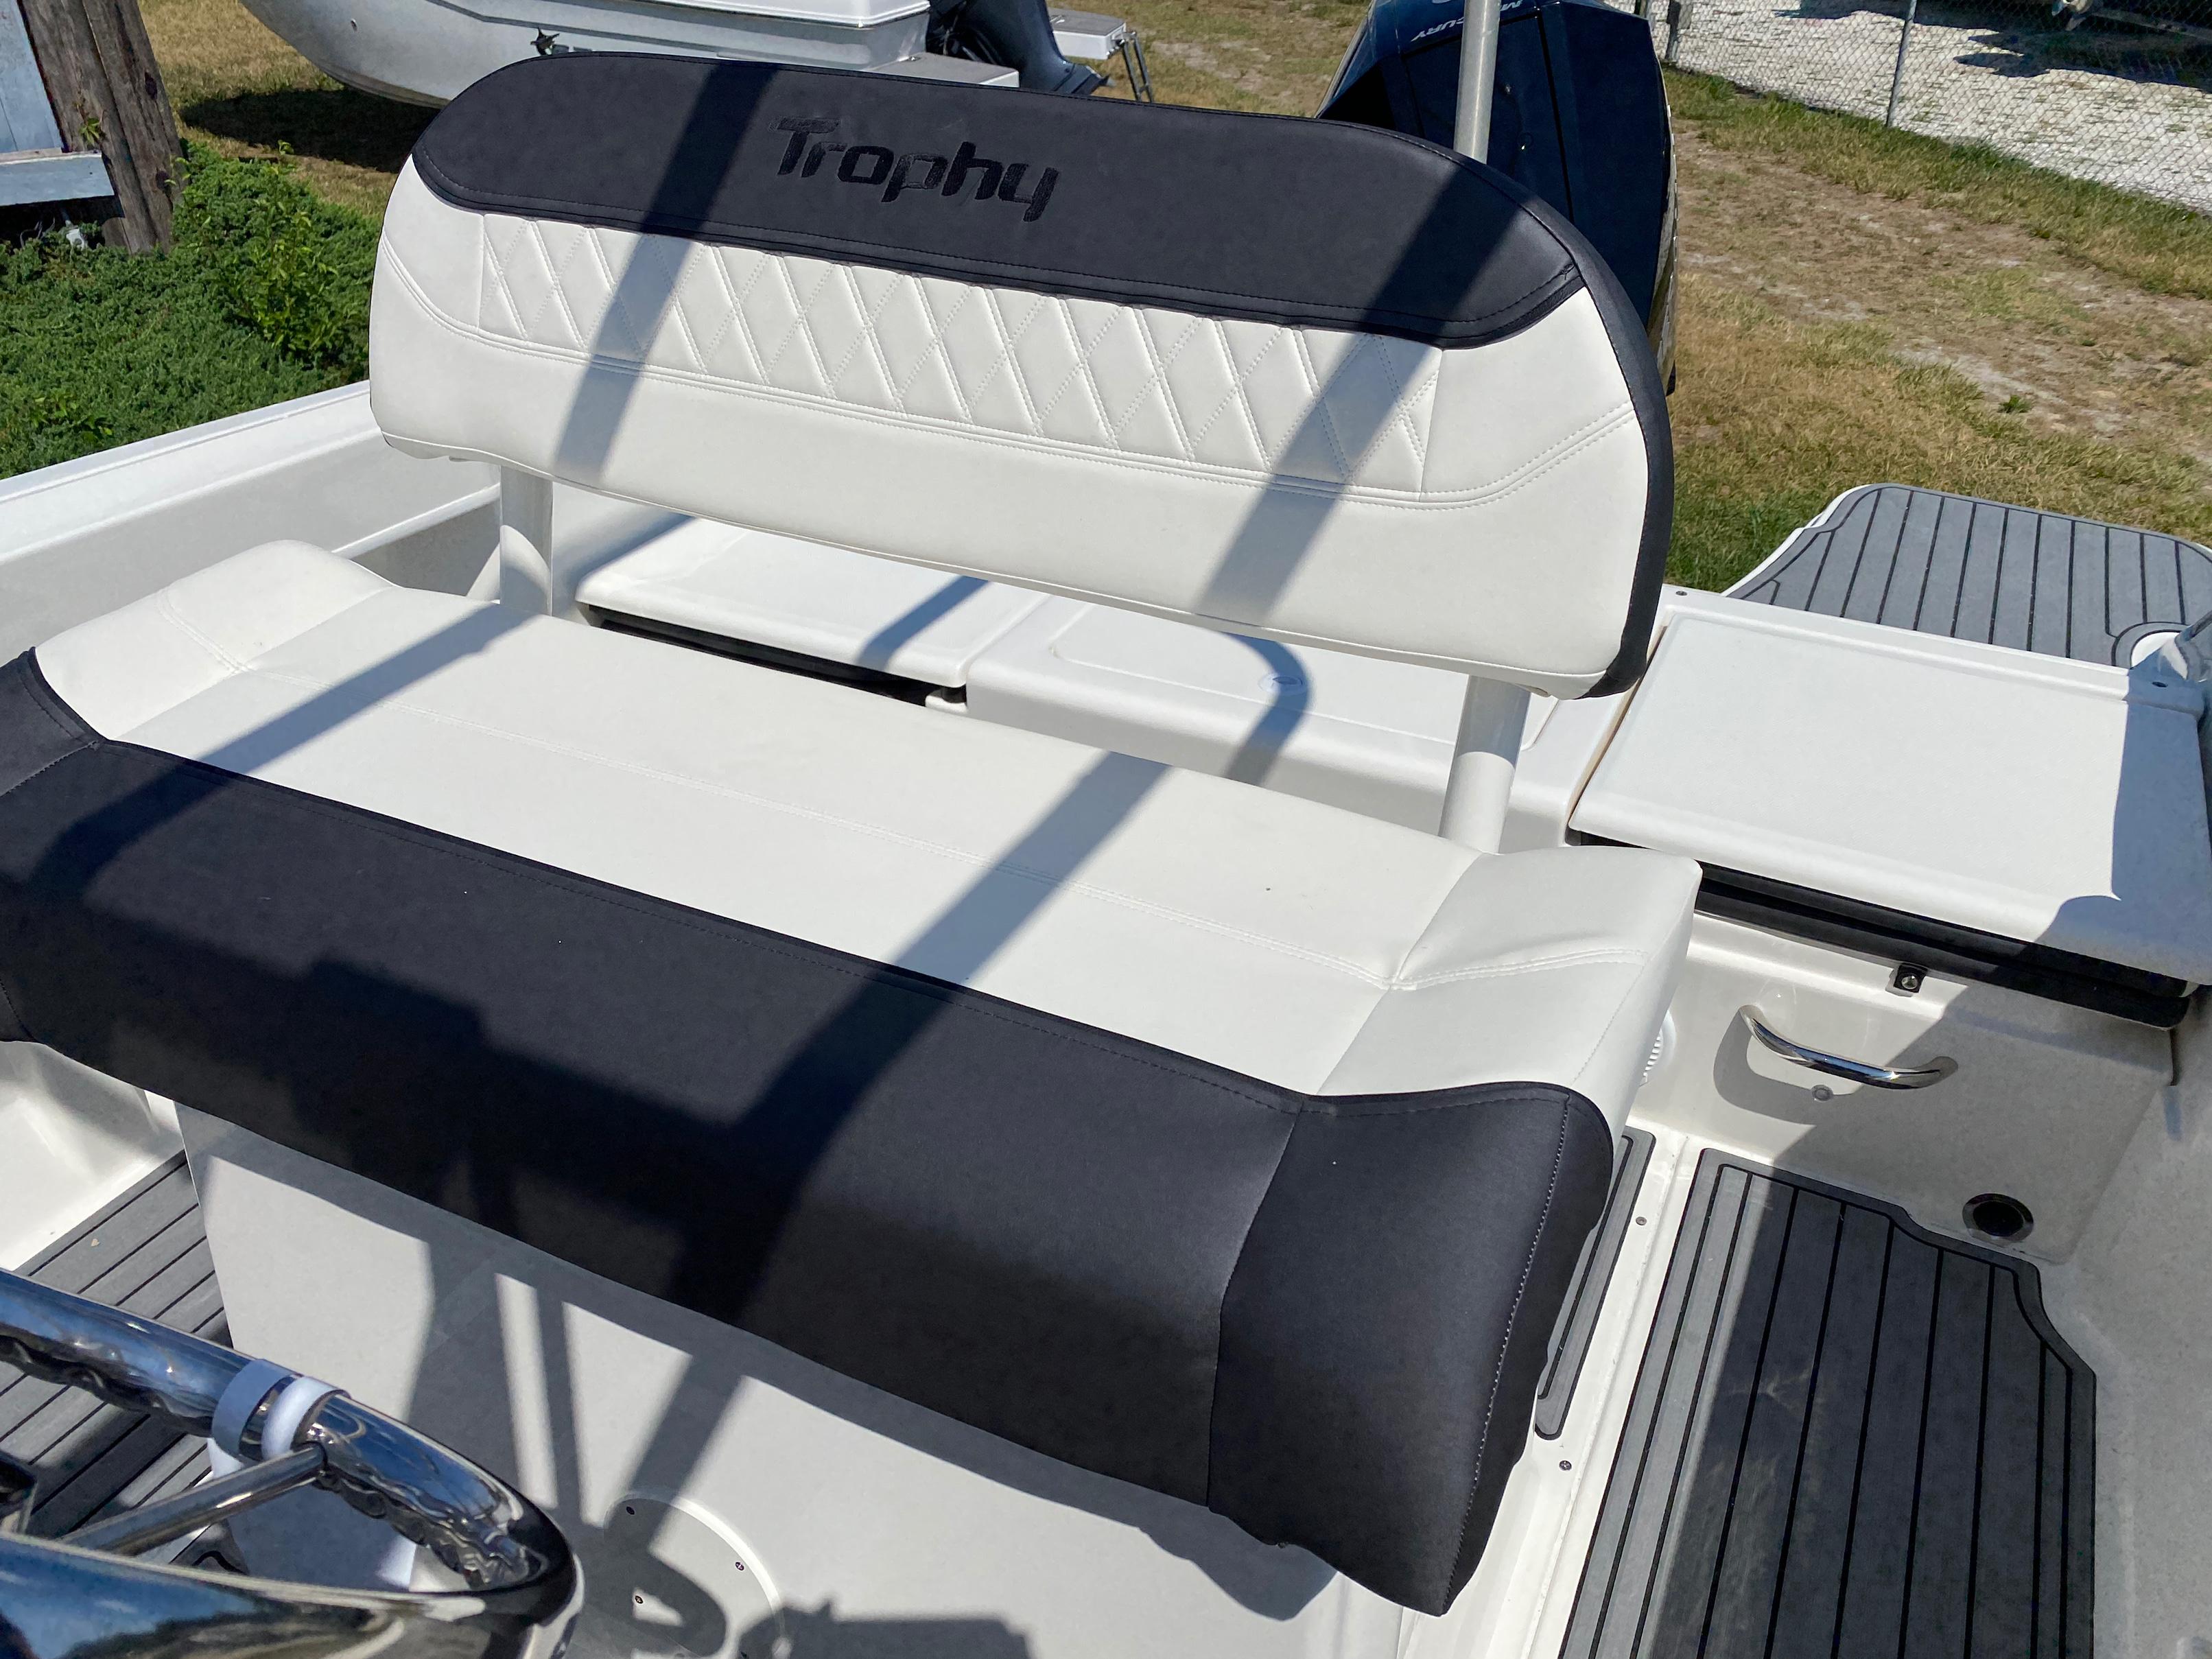 2020 Bayliner boat for sale, model of the boat is Trophy 22CC & Image # 9 of 17